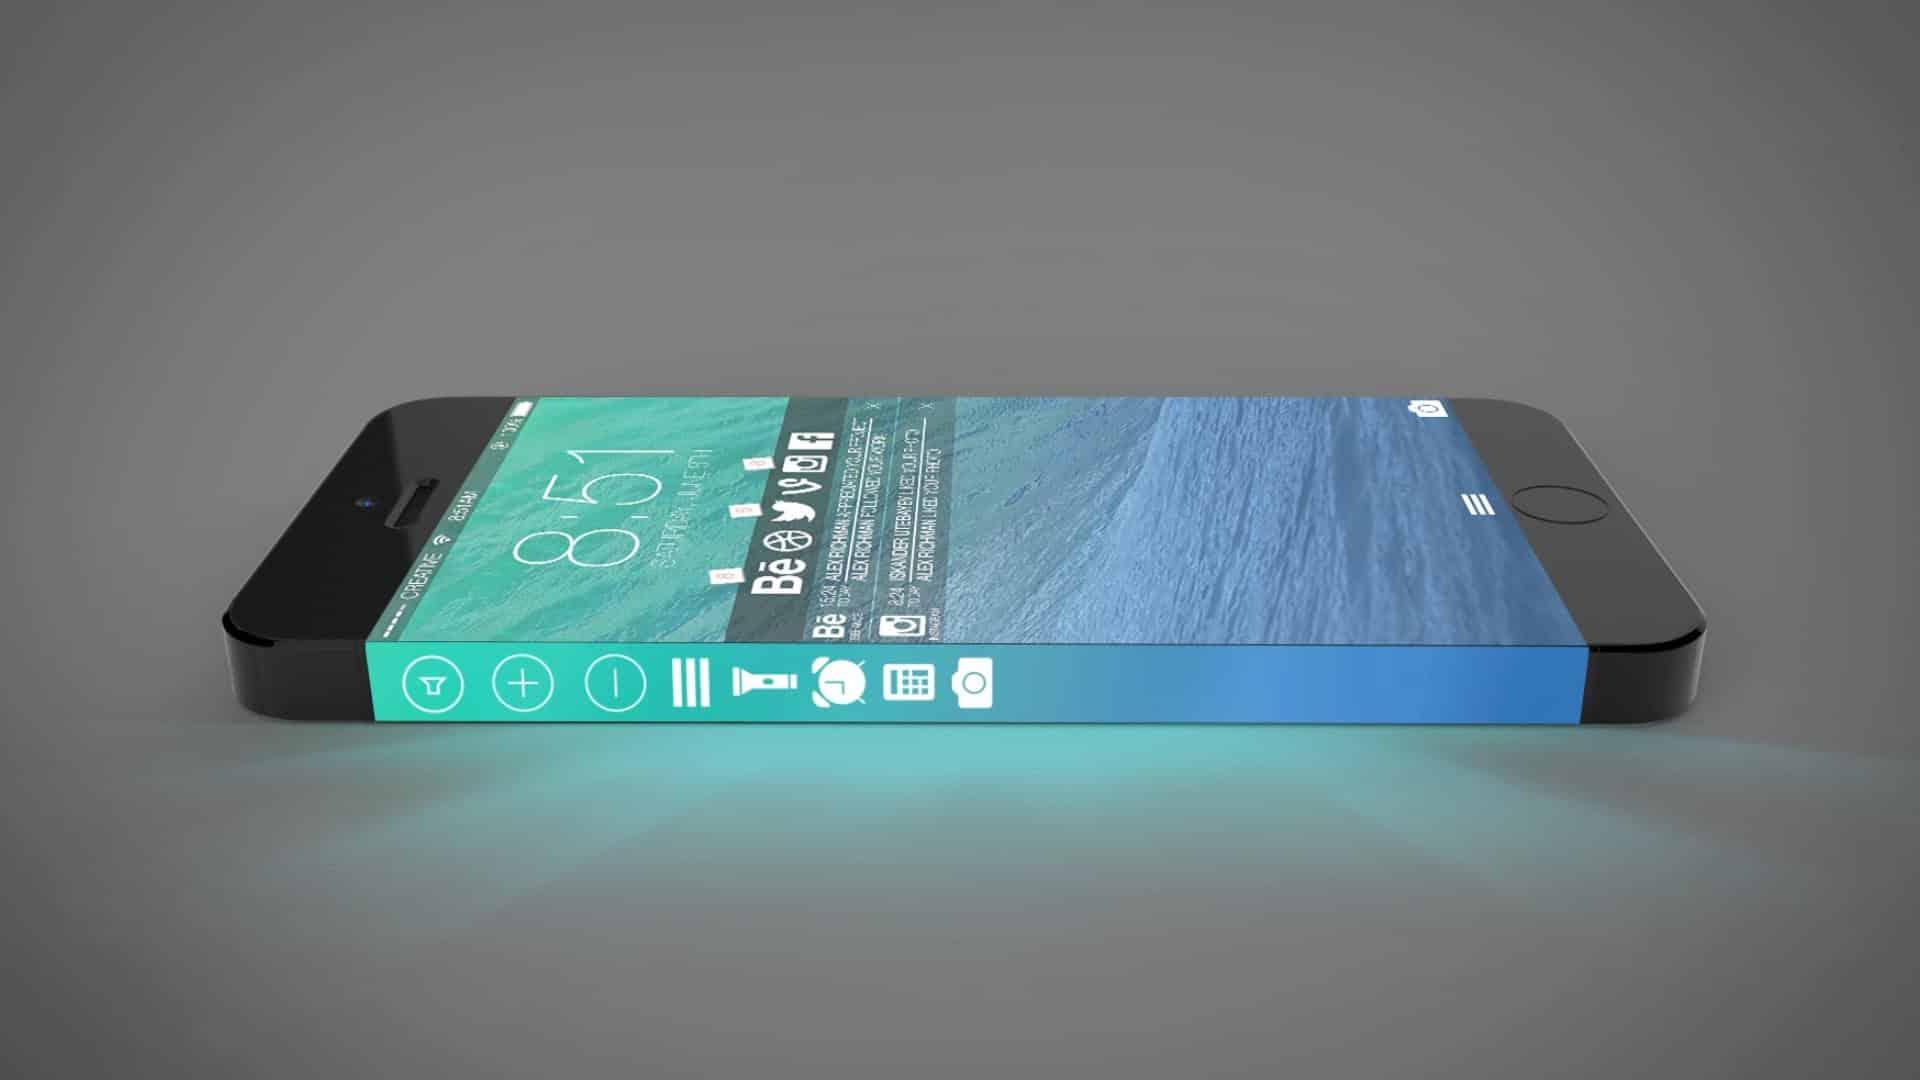 Le dernier iPhone mis en vente